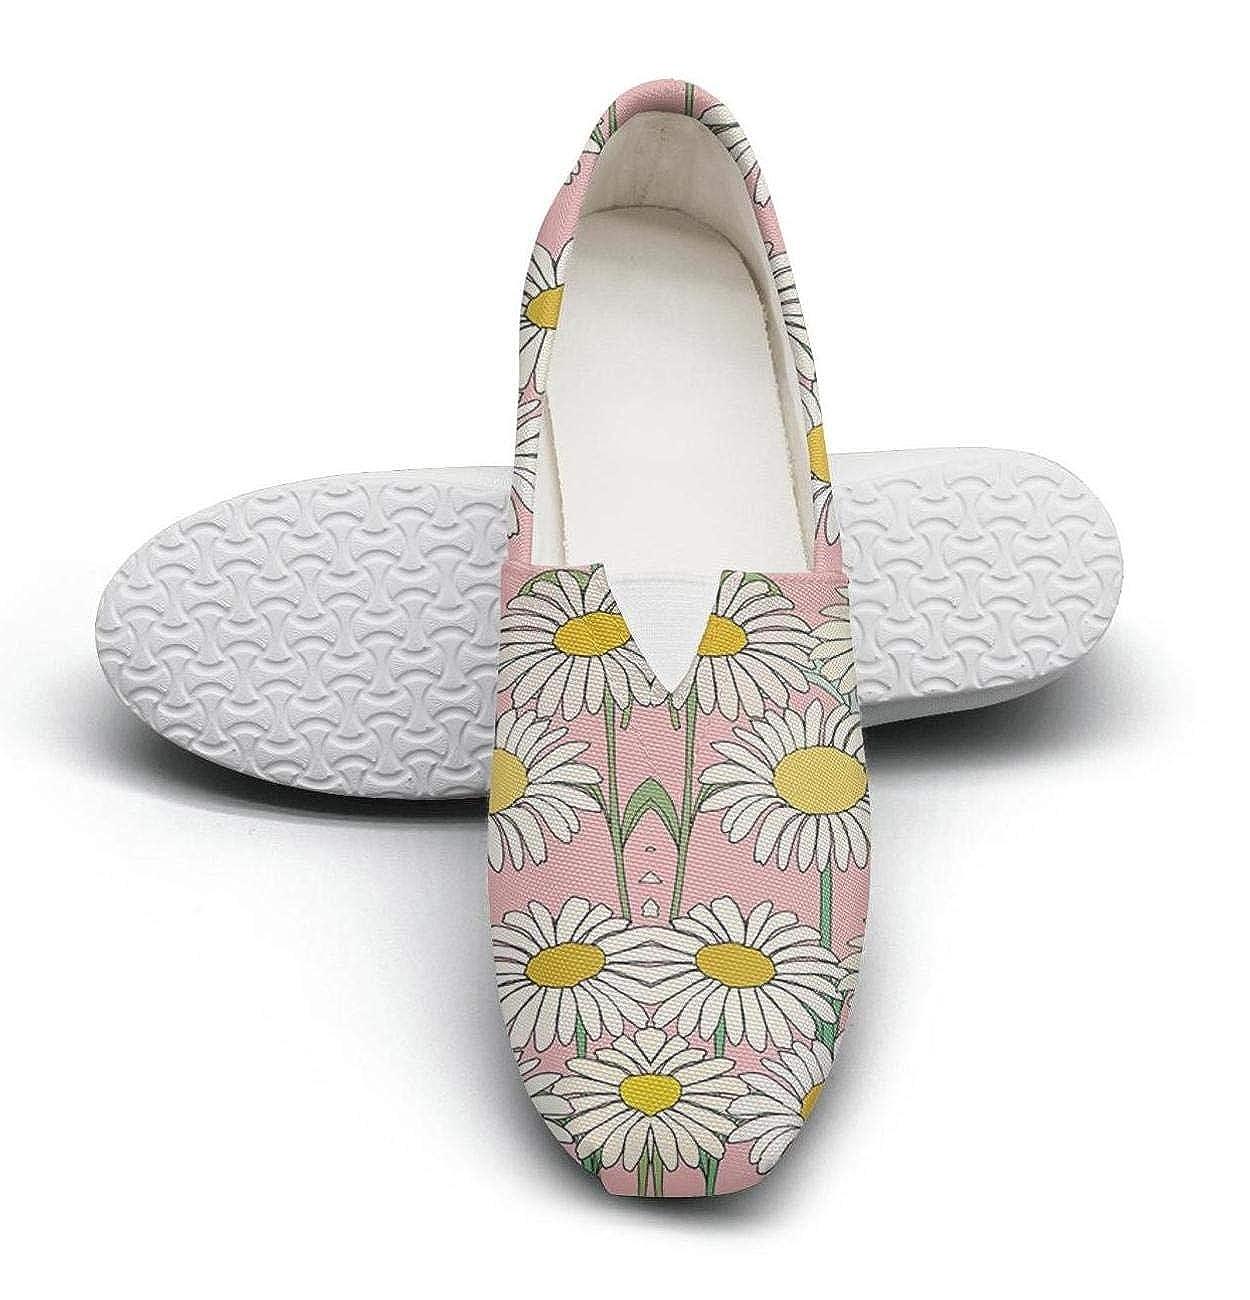 Daisy Sunflower Women Cloth Shoes for Womens Low Cut Lightweight